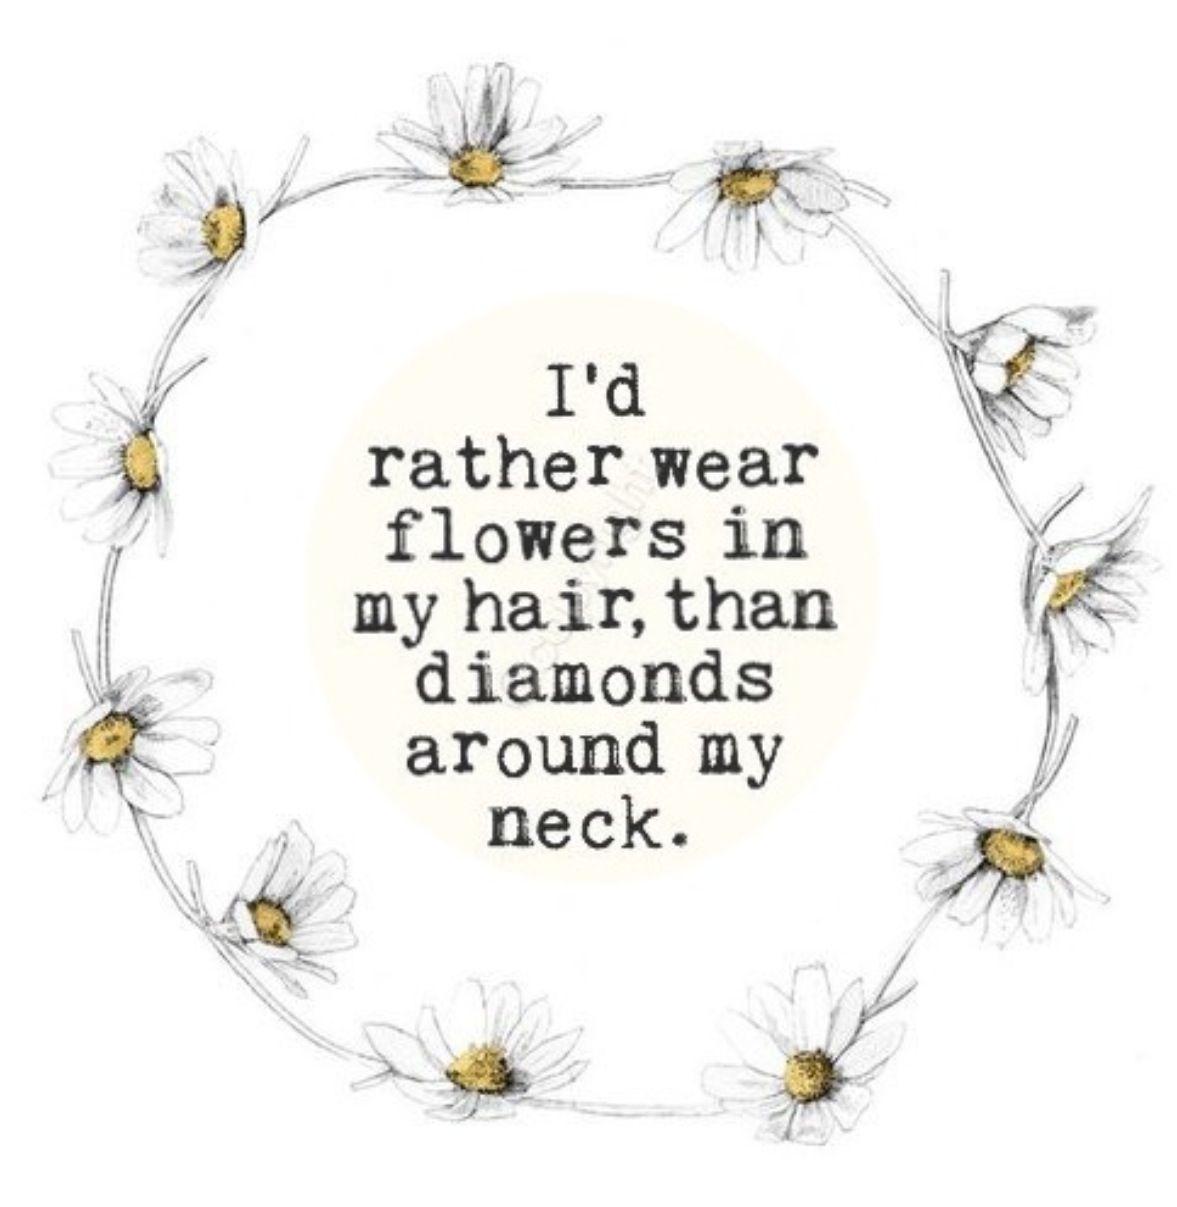 Pin By Lauren Ehrendreich On Tumblr 3 Pinterest Quotes Words